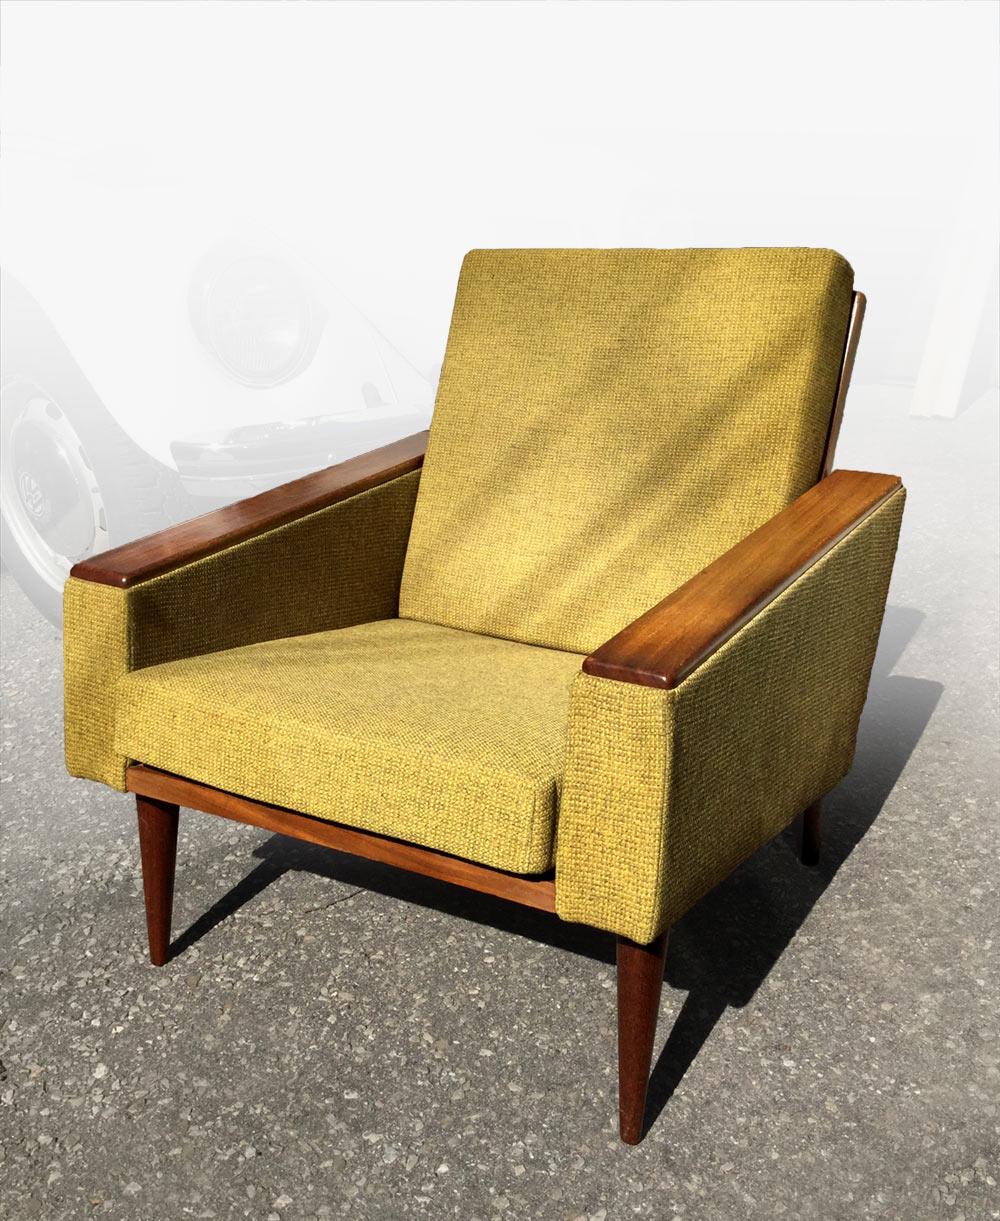 square_chair.jpg